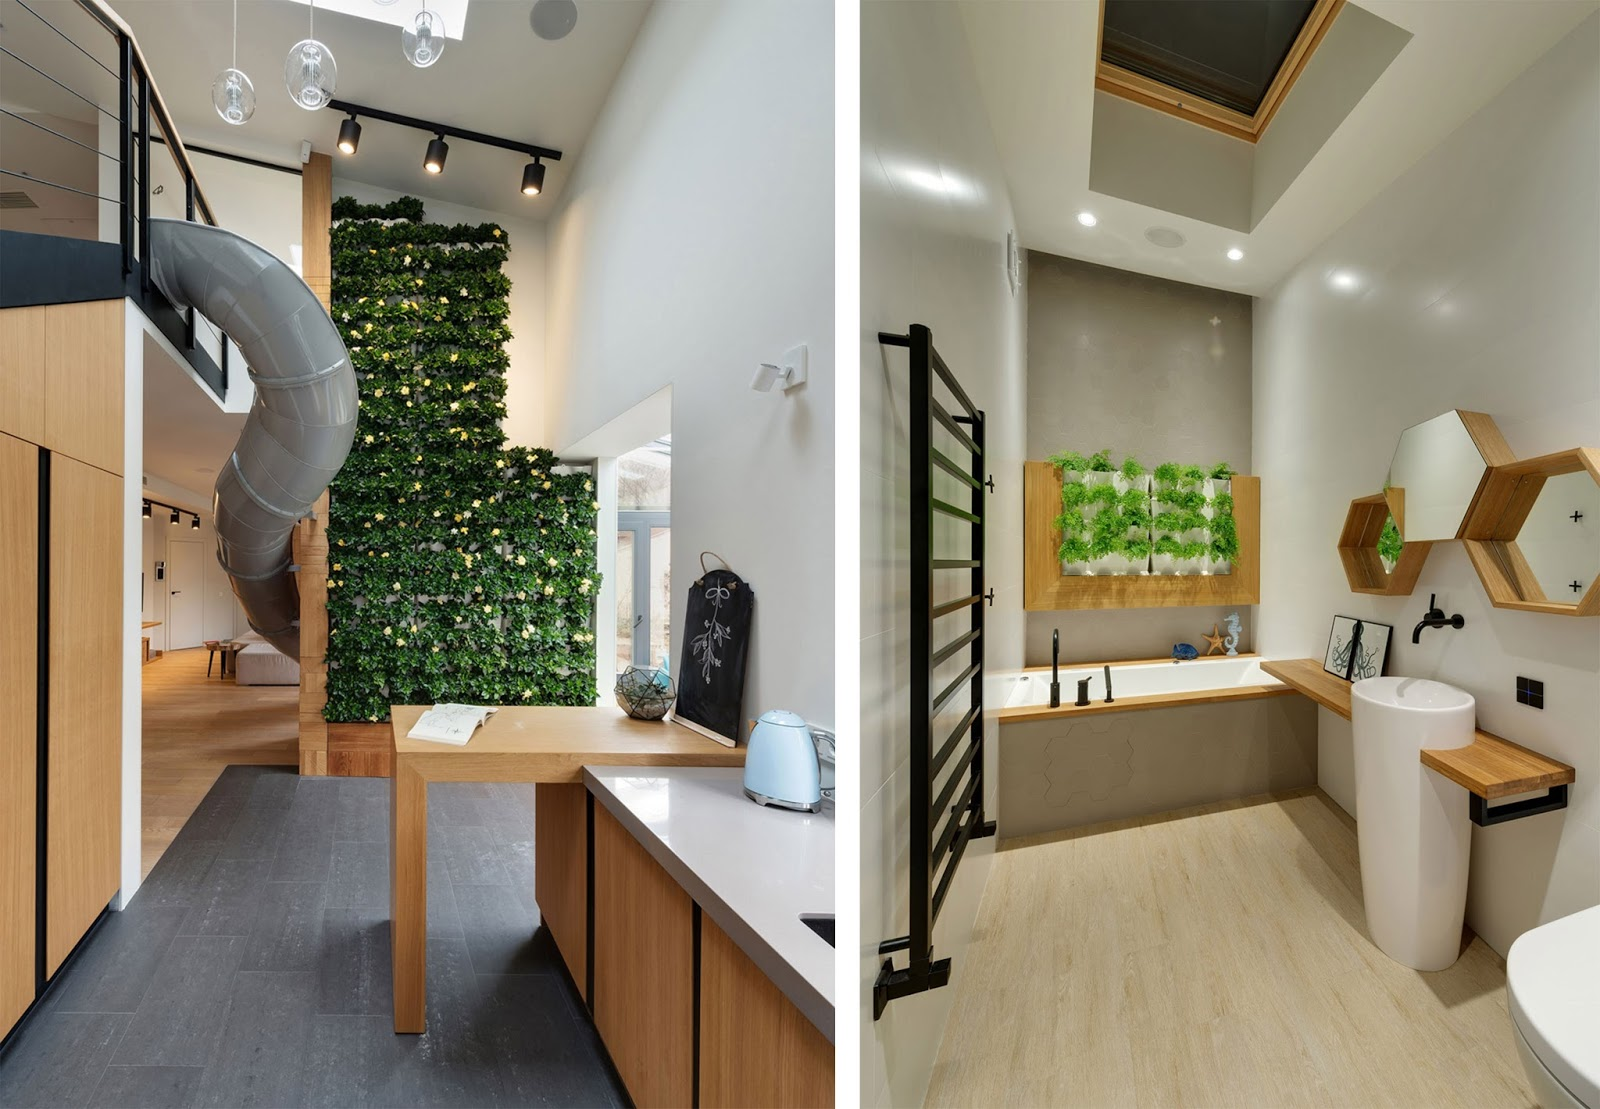 Casa con scivolo interno e parete verde a Kiev by KI Design  ARC ART blog by Daniele Drigo